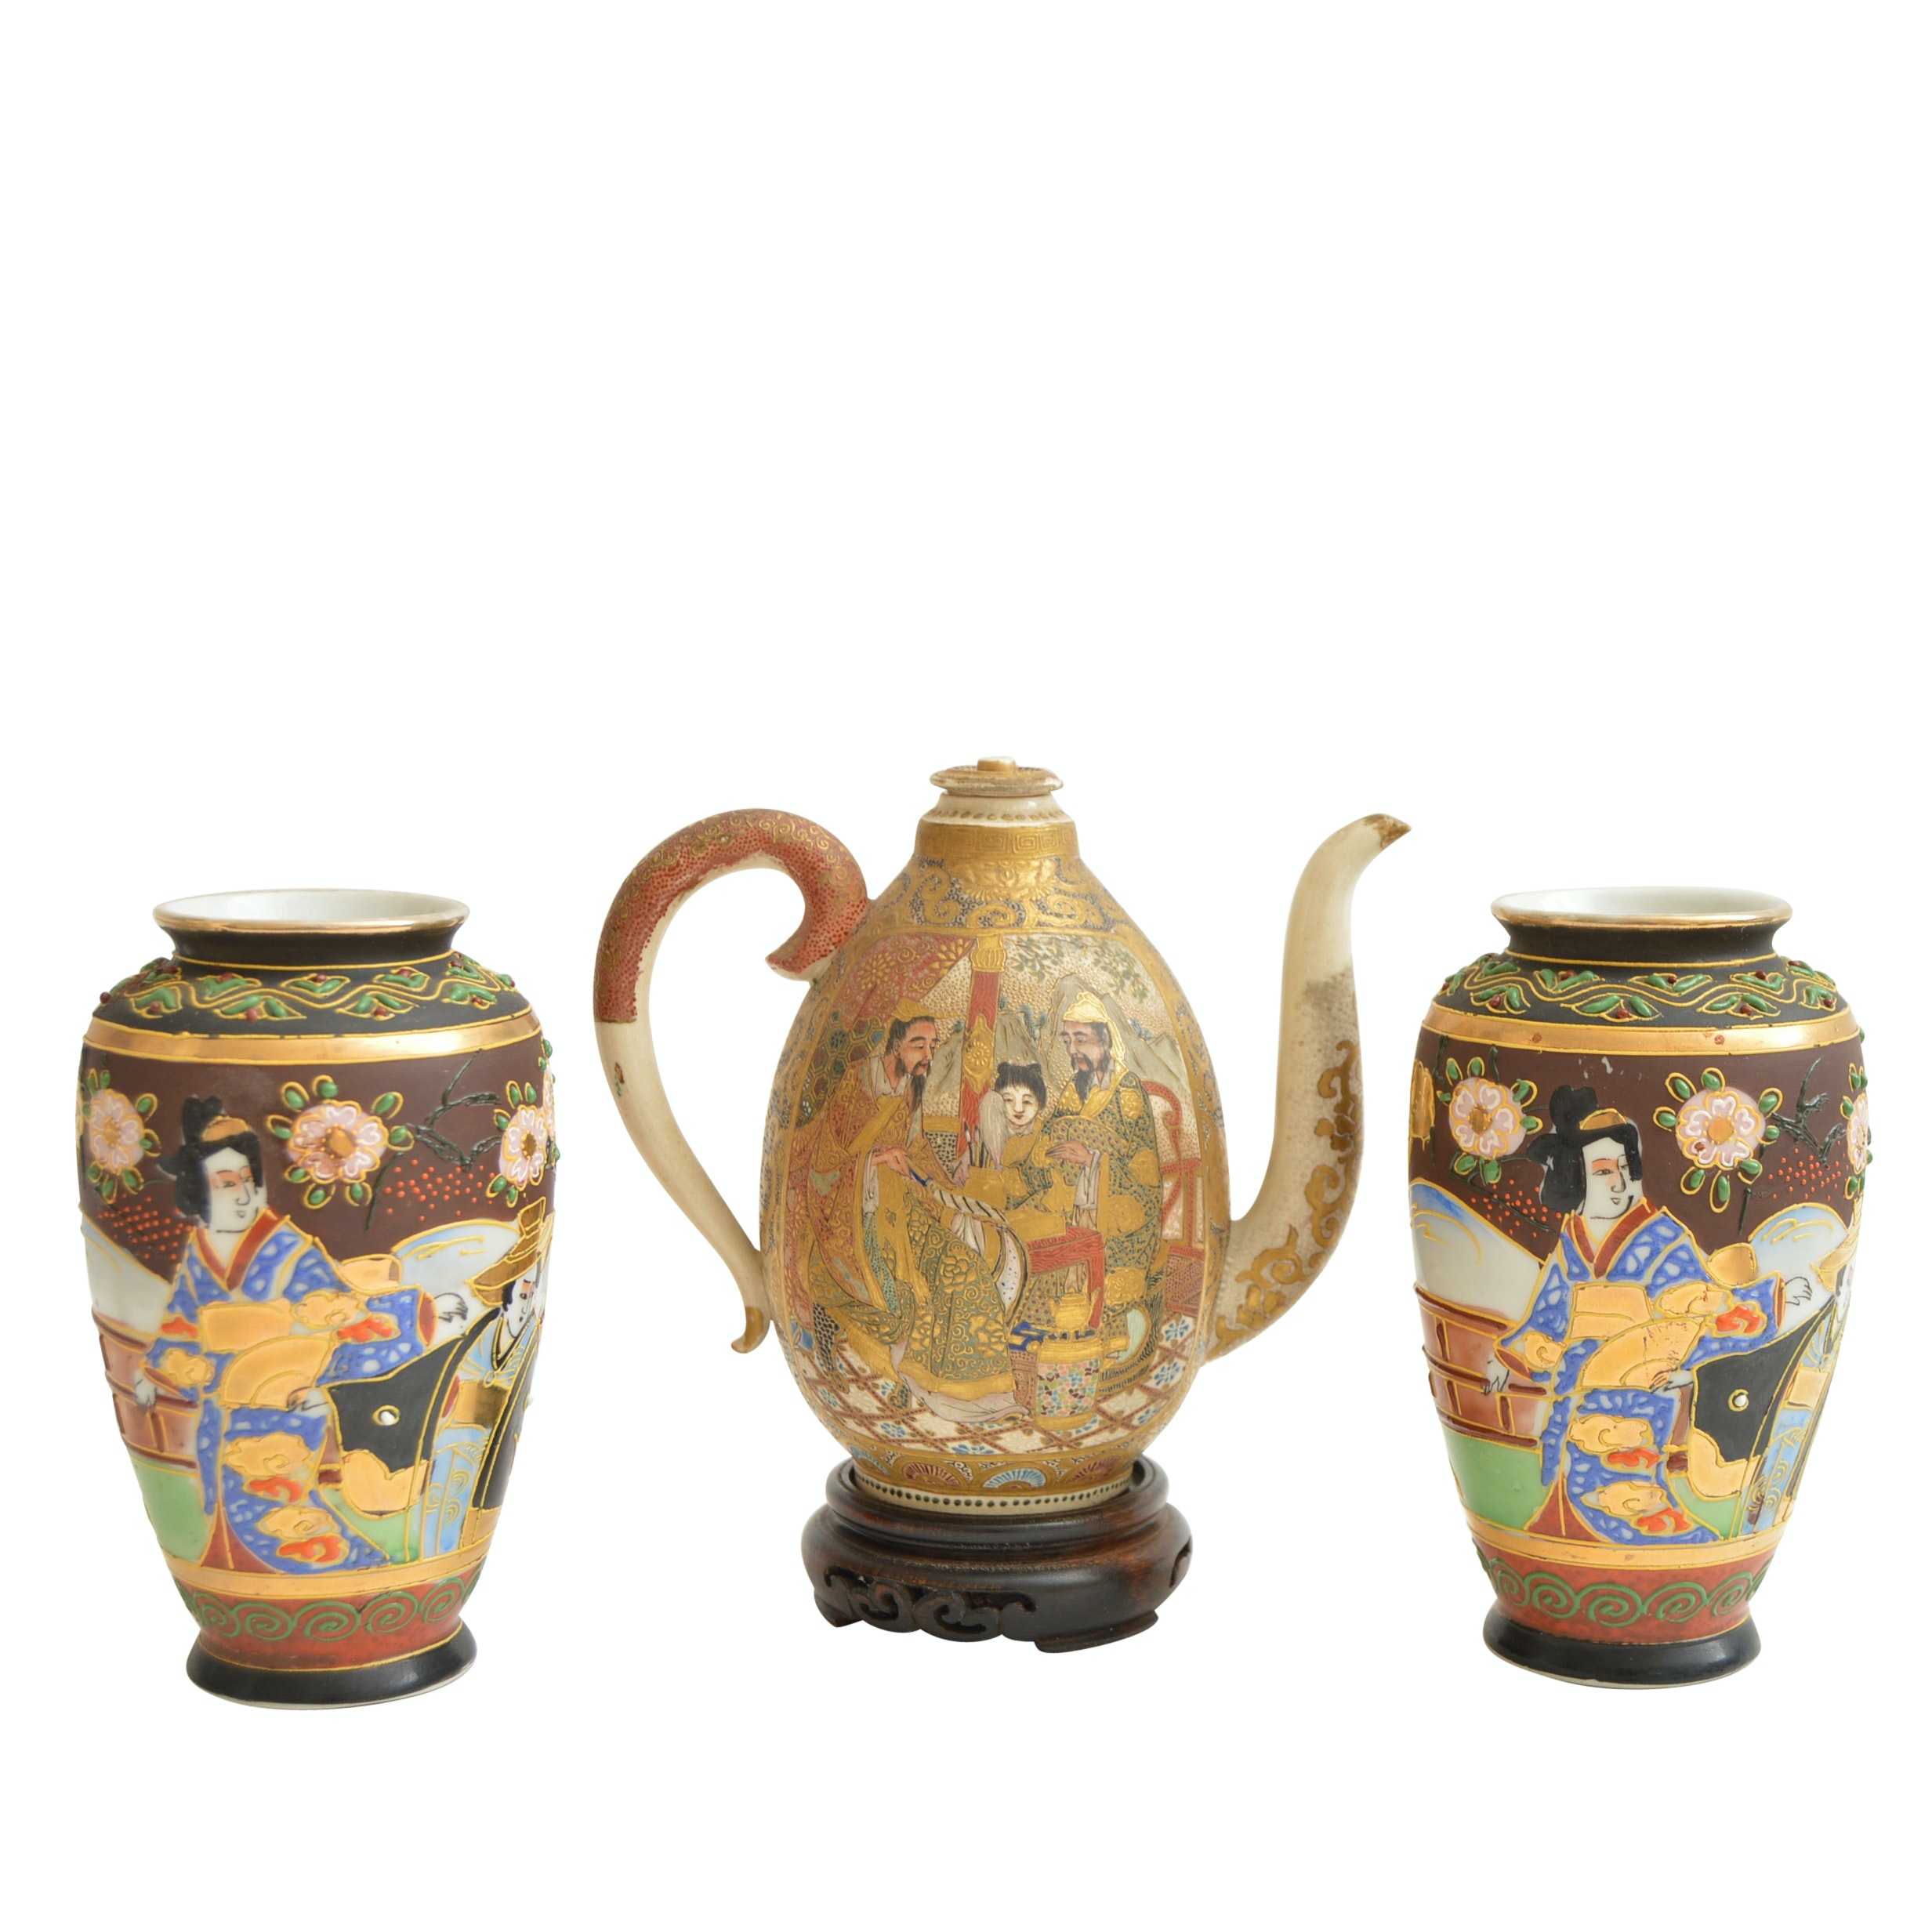 Vintage Satsuma Japanese Vases and Teapot